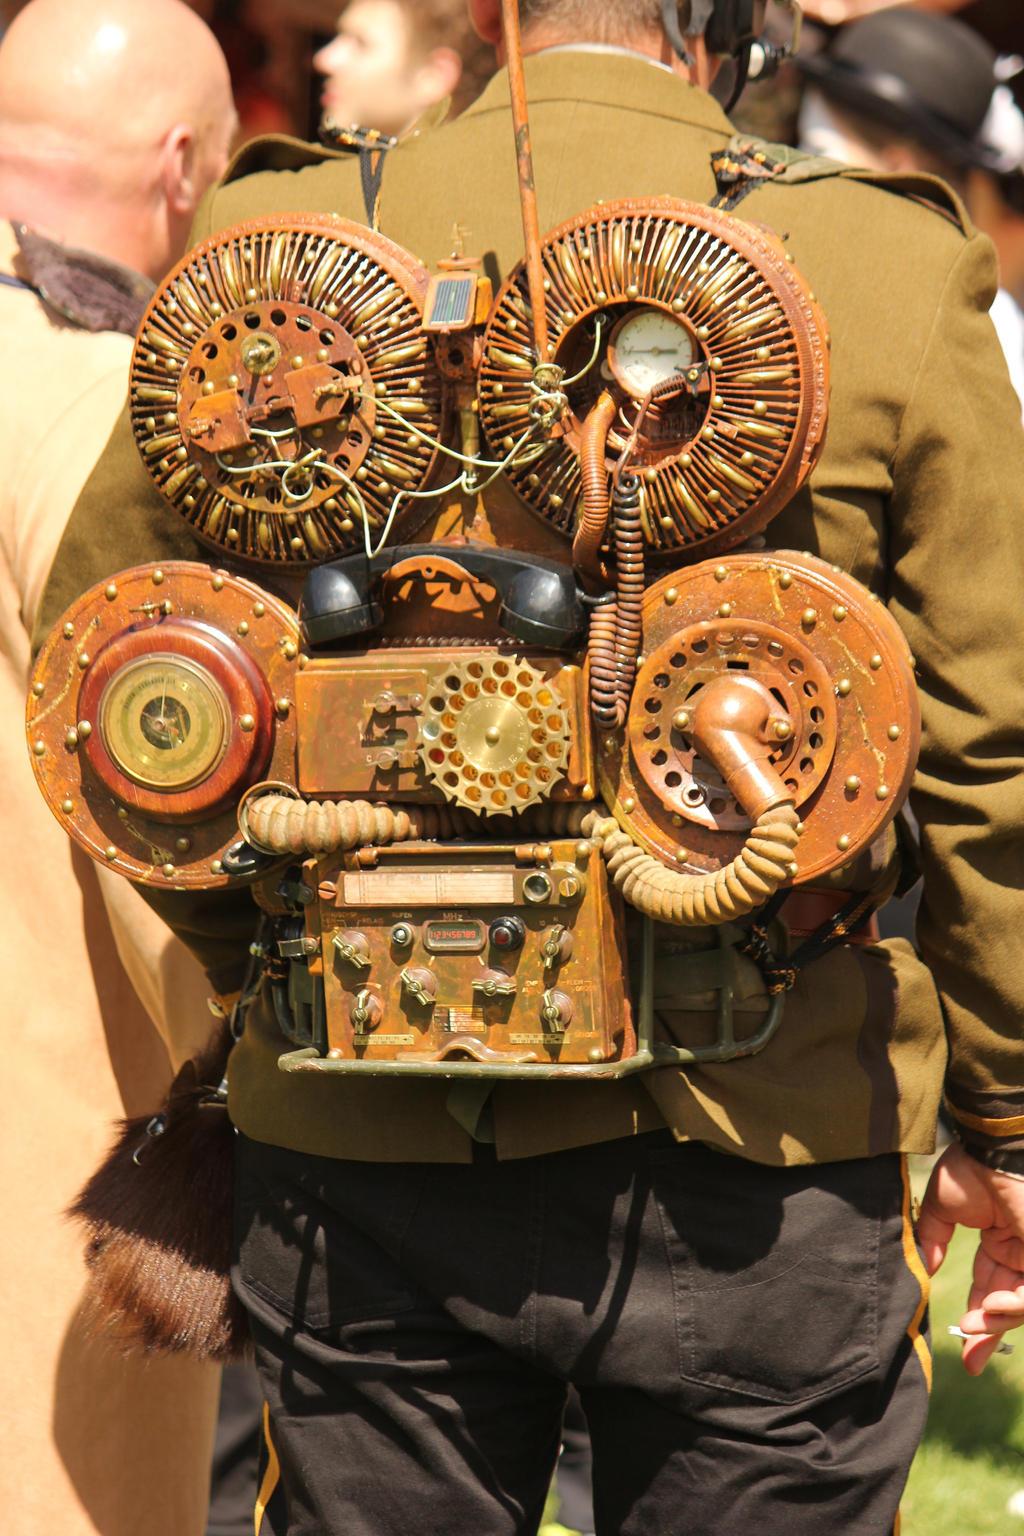 Steampunk device